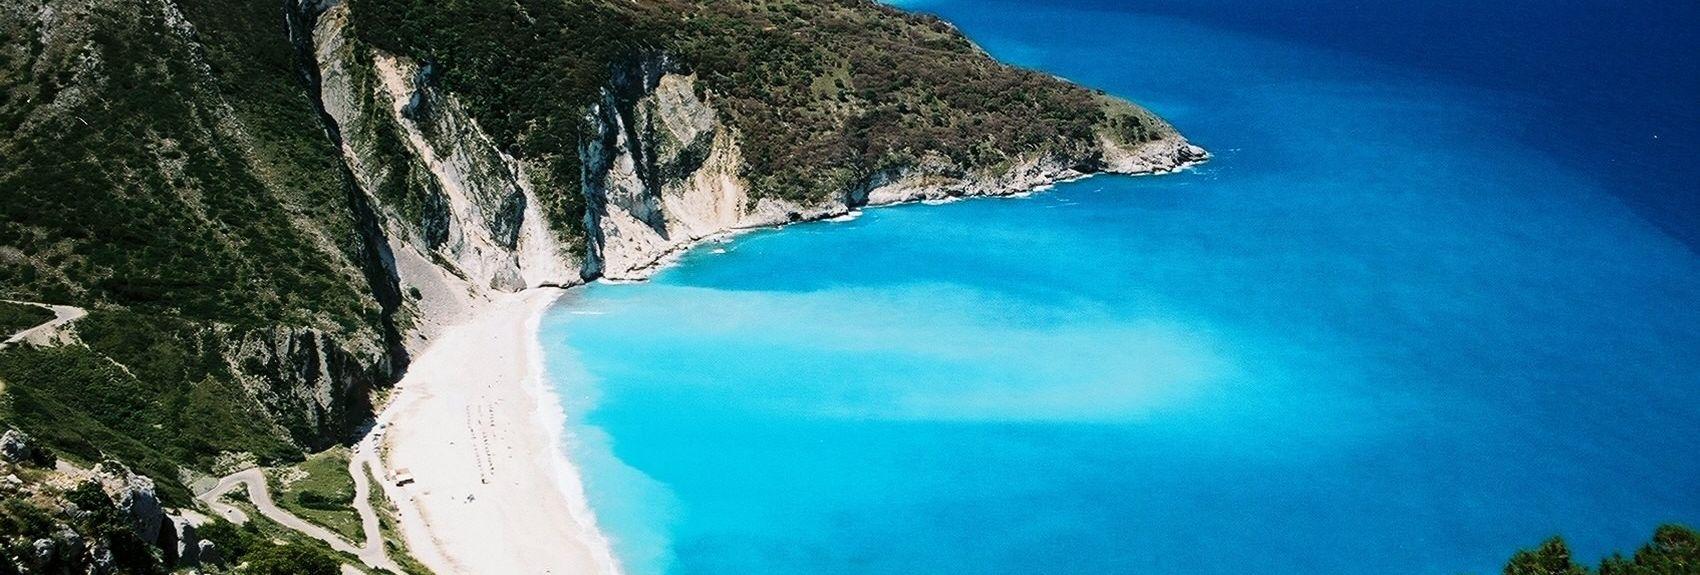 Pesada, Kefalonia, Ionian Islands Region, Greece